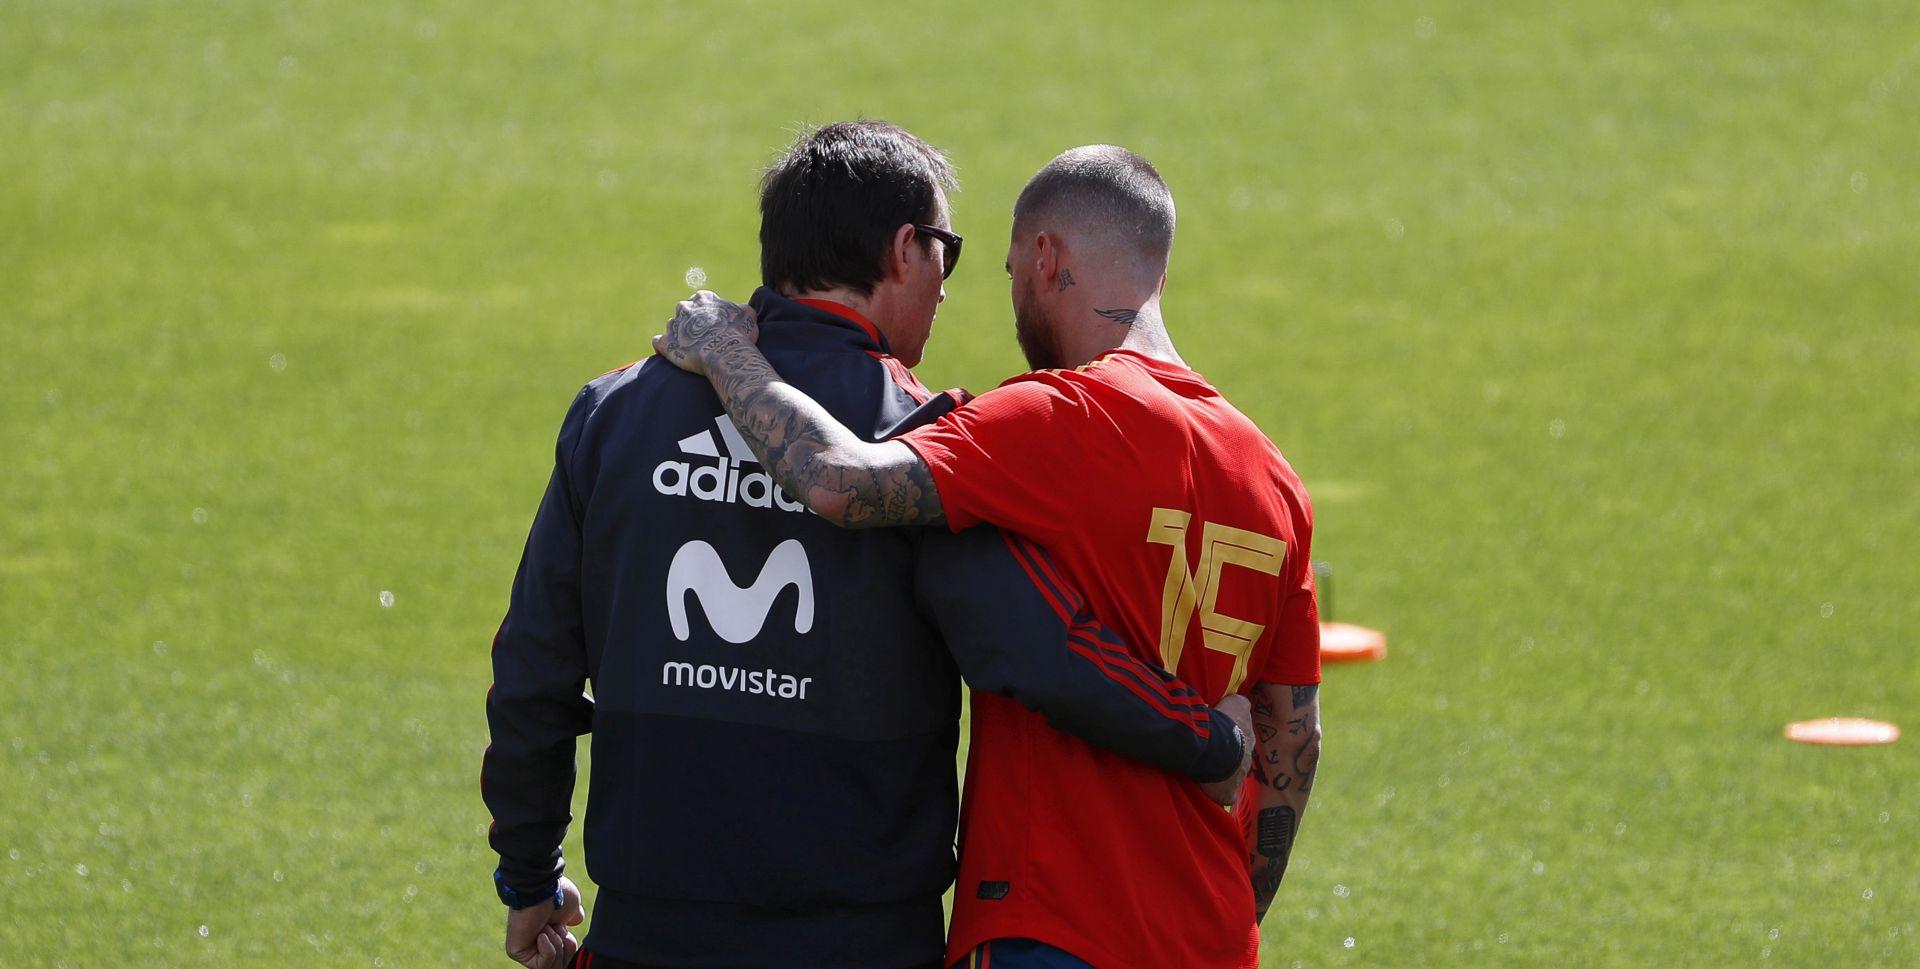 DVA DANA PRIJE PRVE UTAKMICE  Španjolska smijenila izbornika zbog Reala